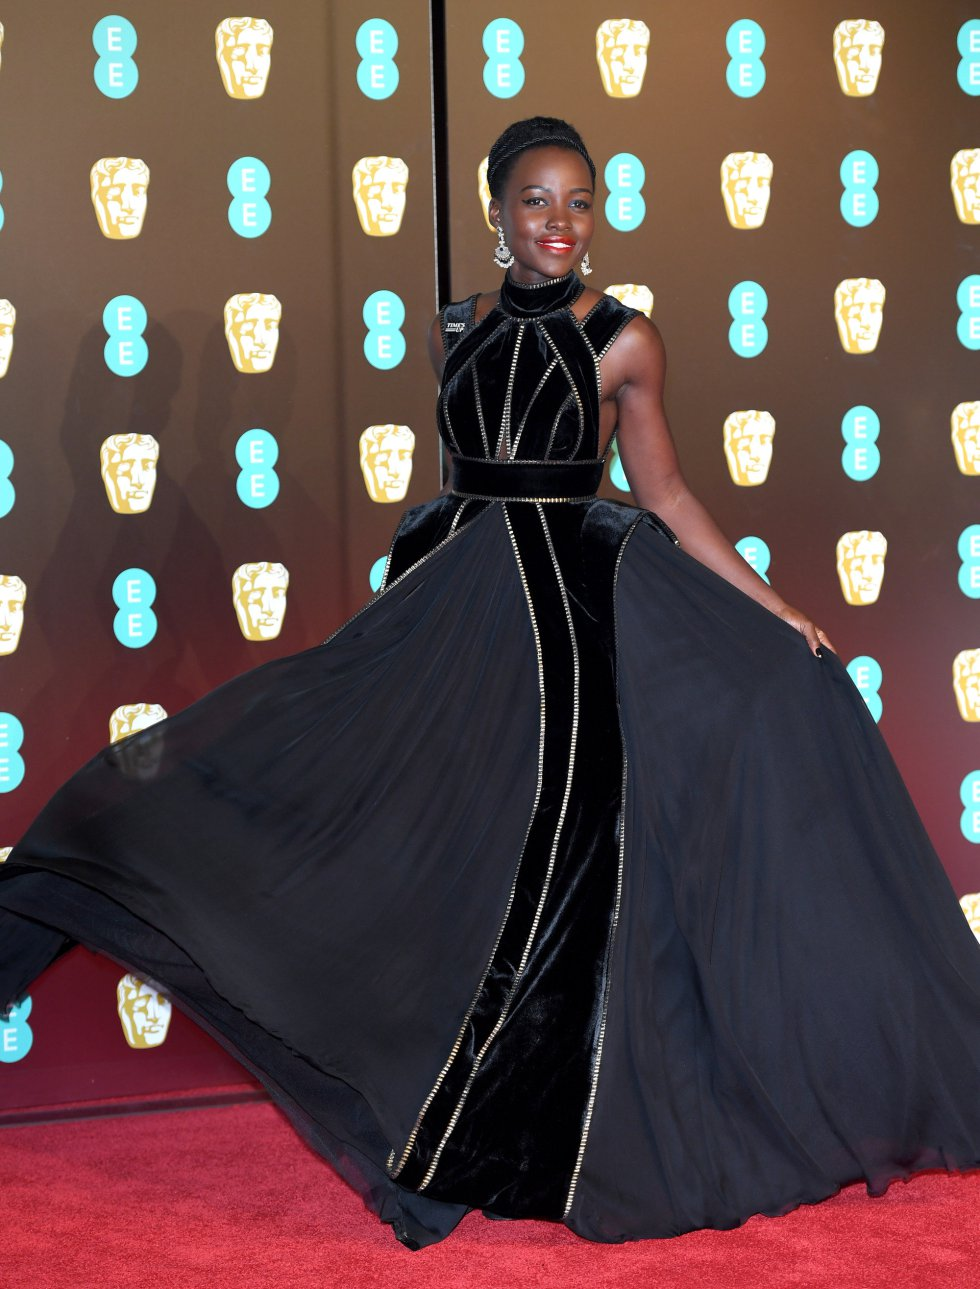 La oscarizada actriz Lupita Nyong'o